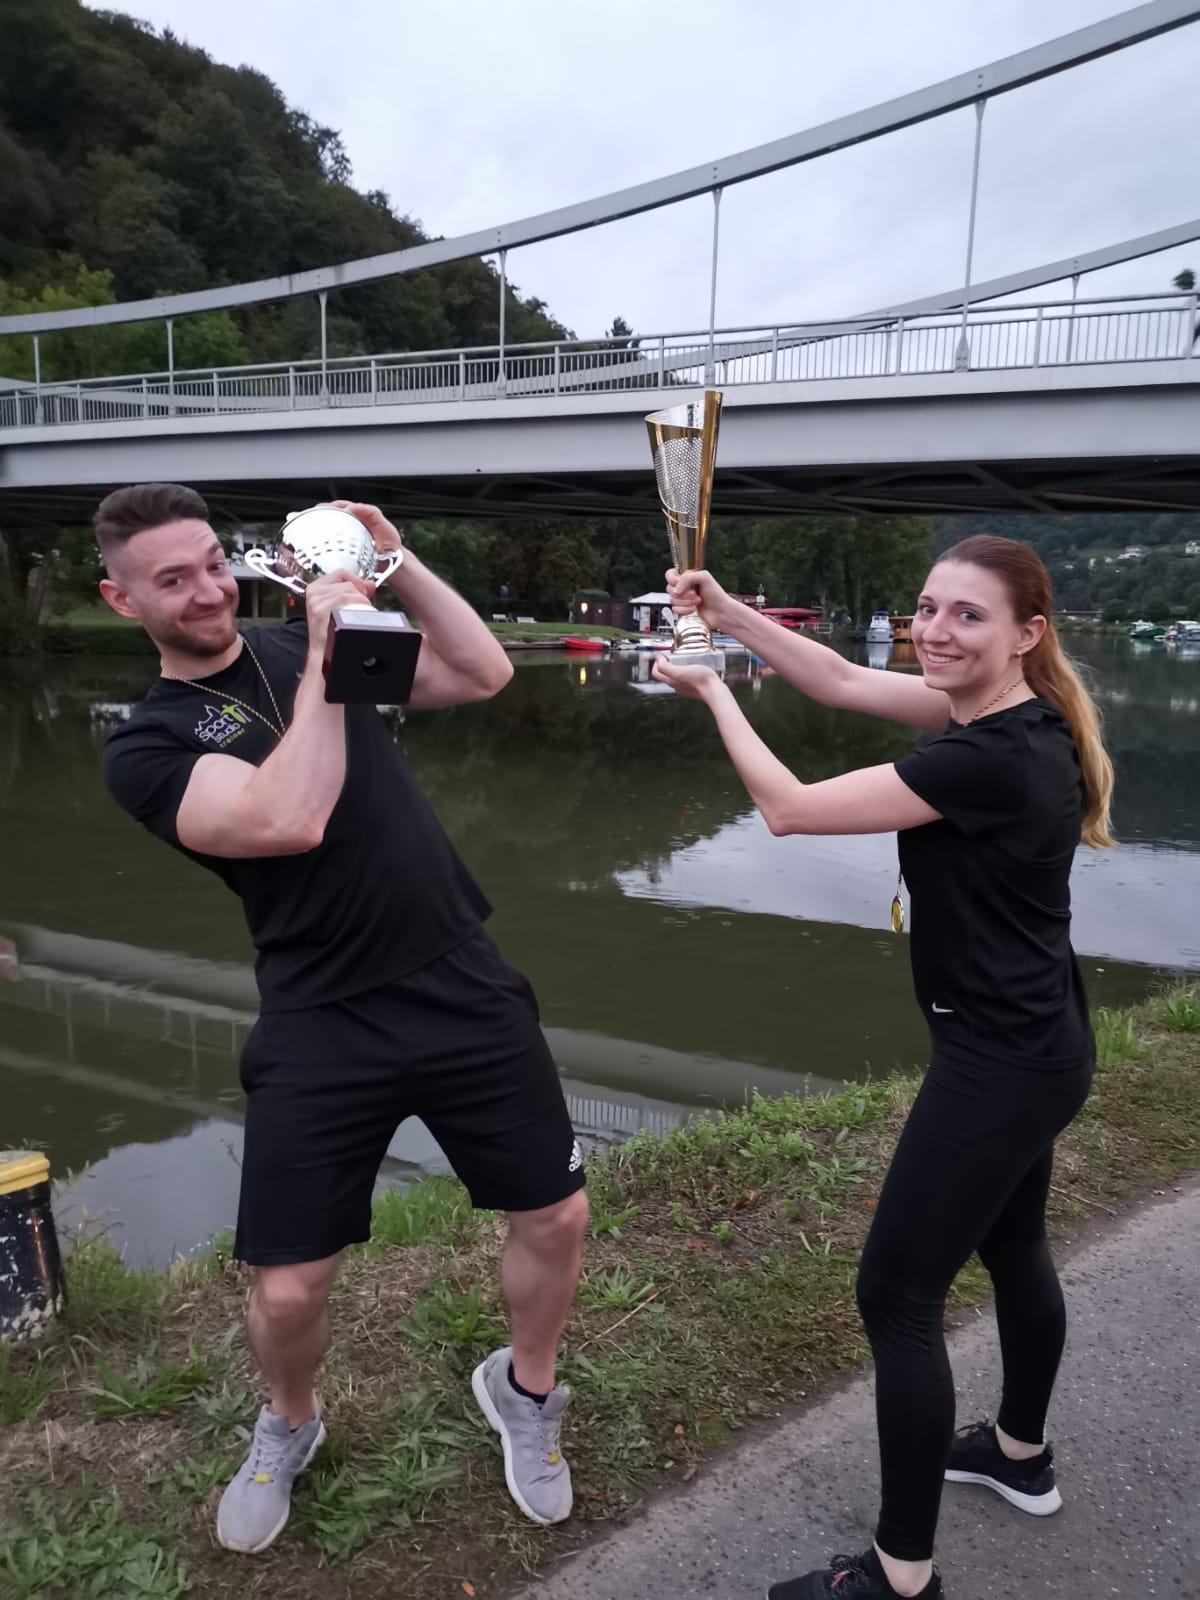 Andy und Johanna im Pokalkampf